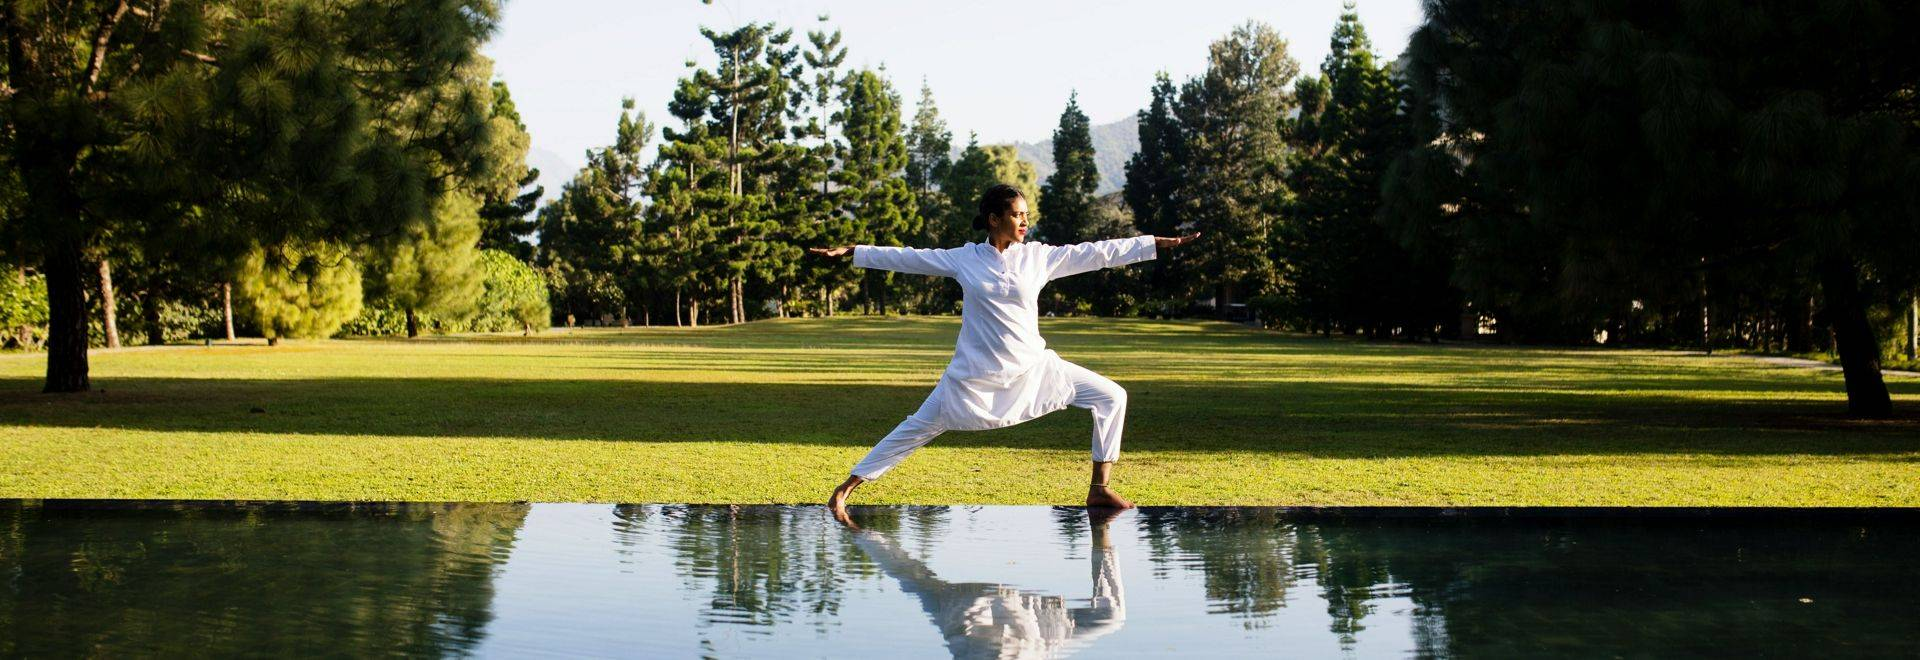 Ananda-yoga-pose-4.jpg